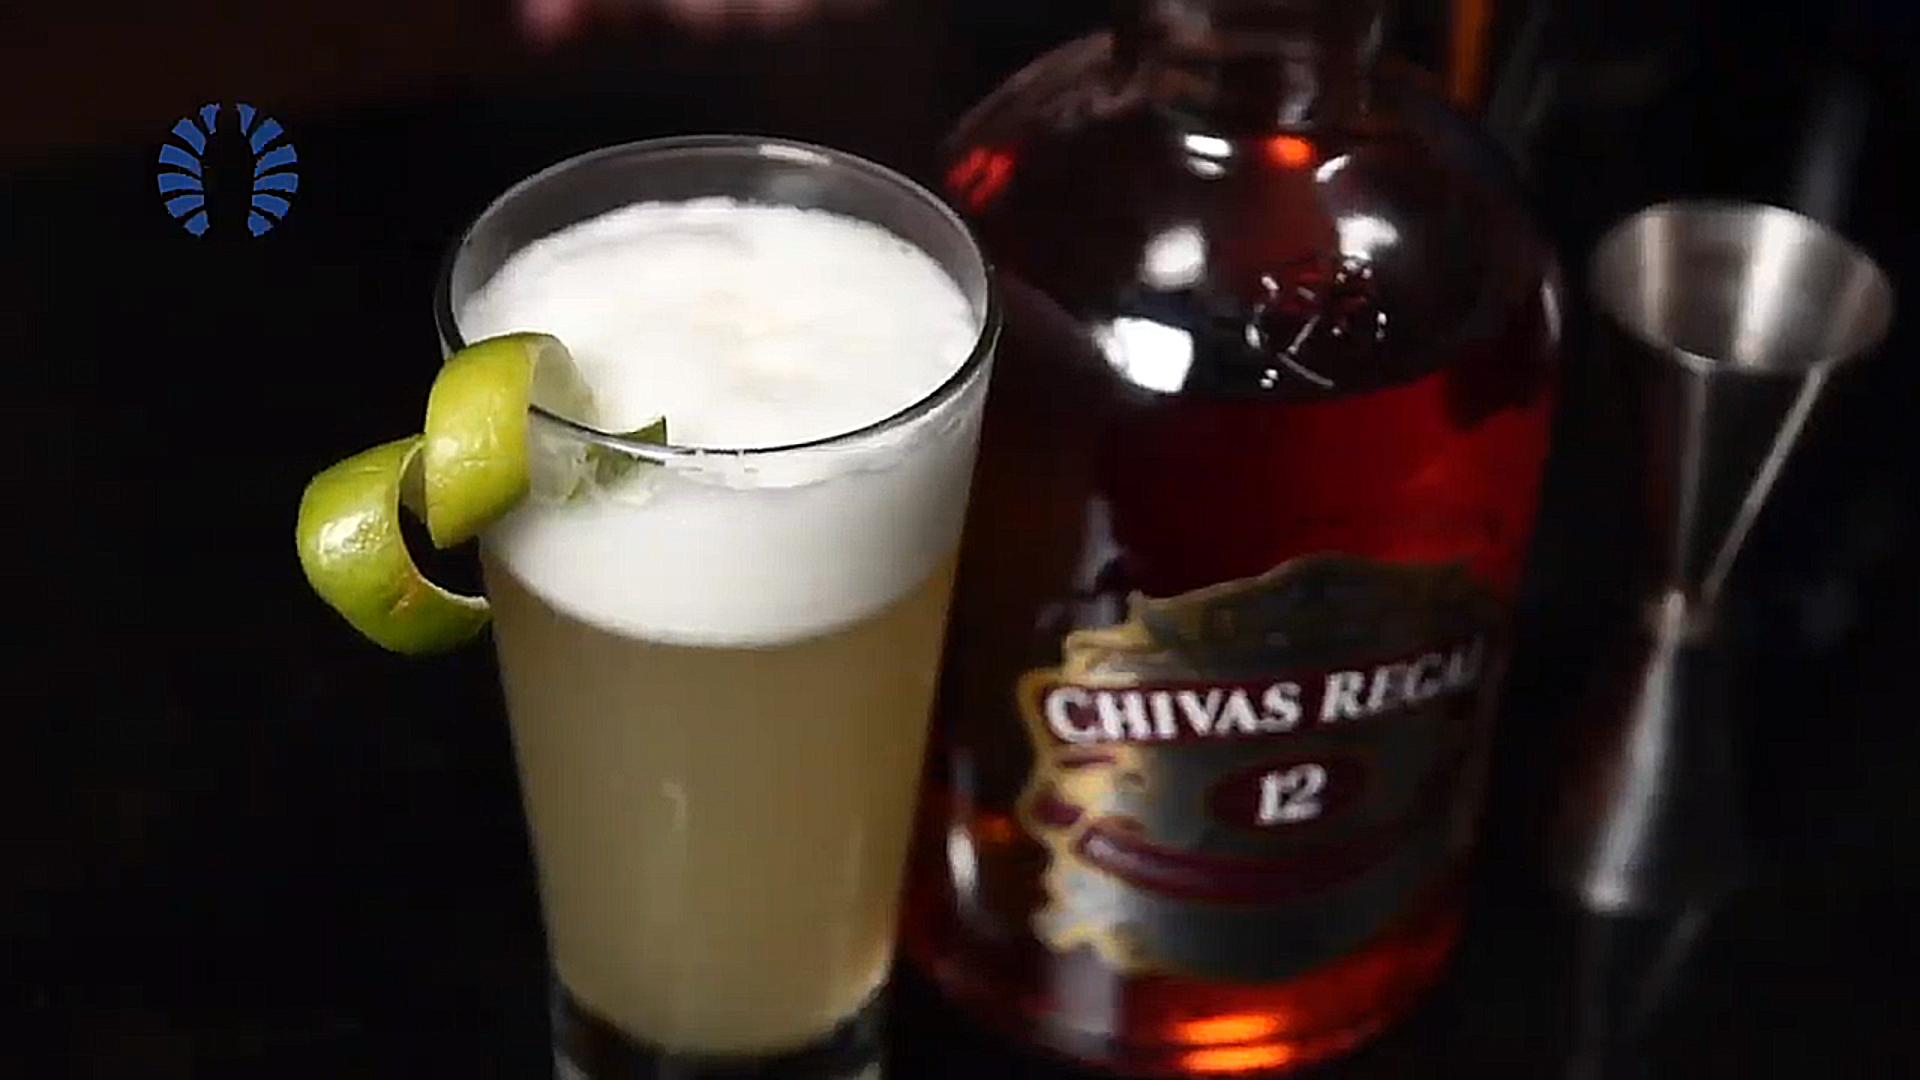 cocktails com chivas regal